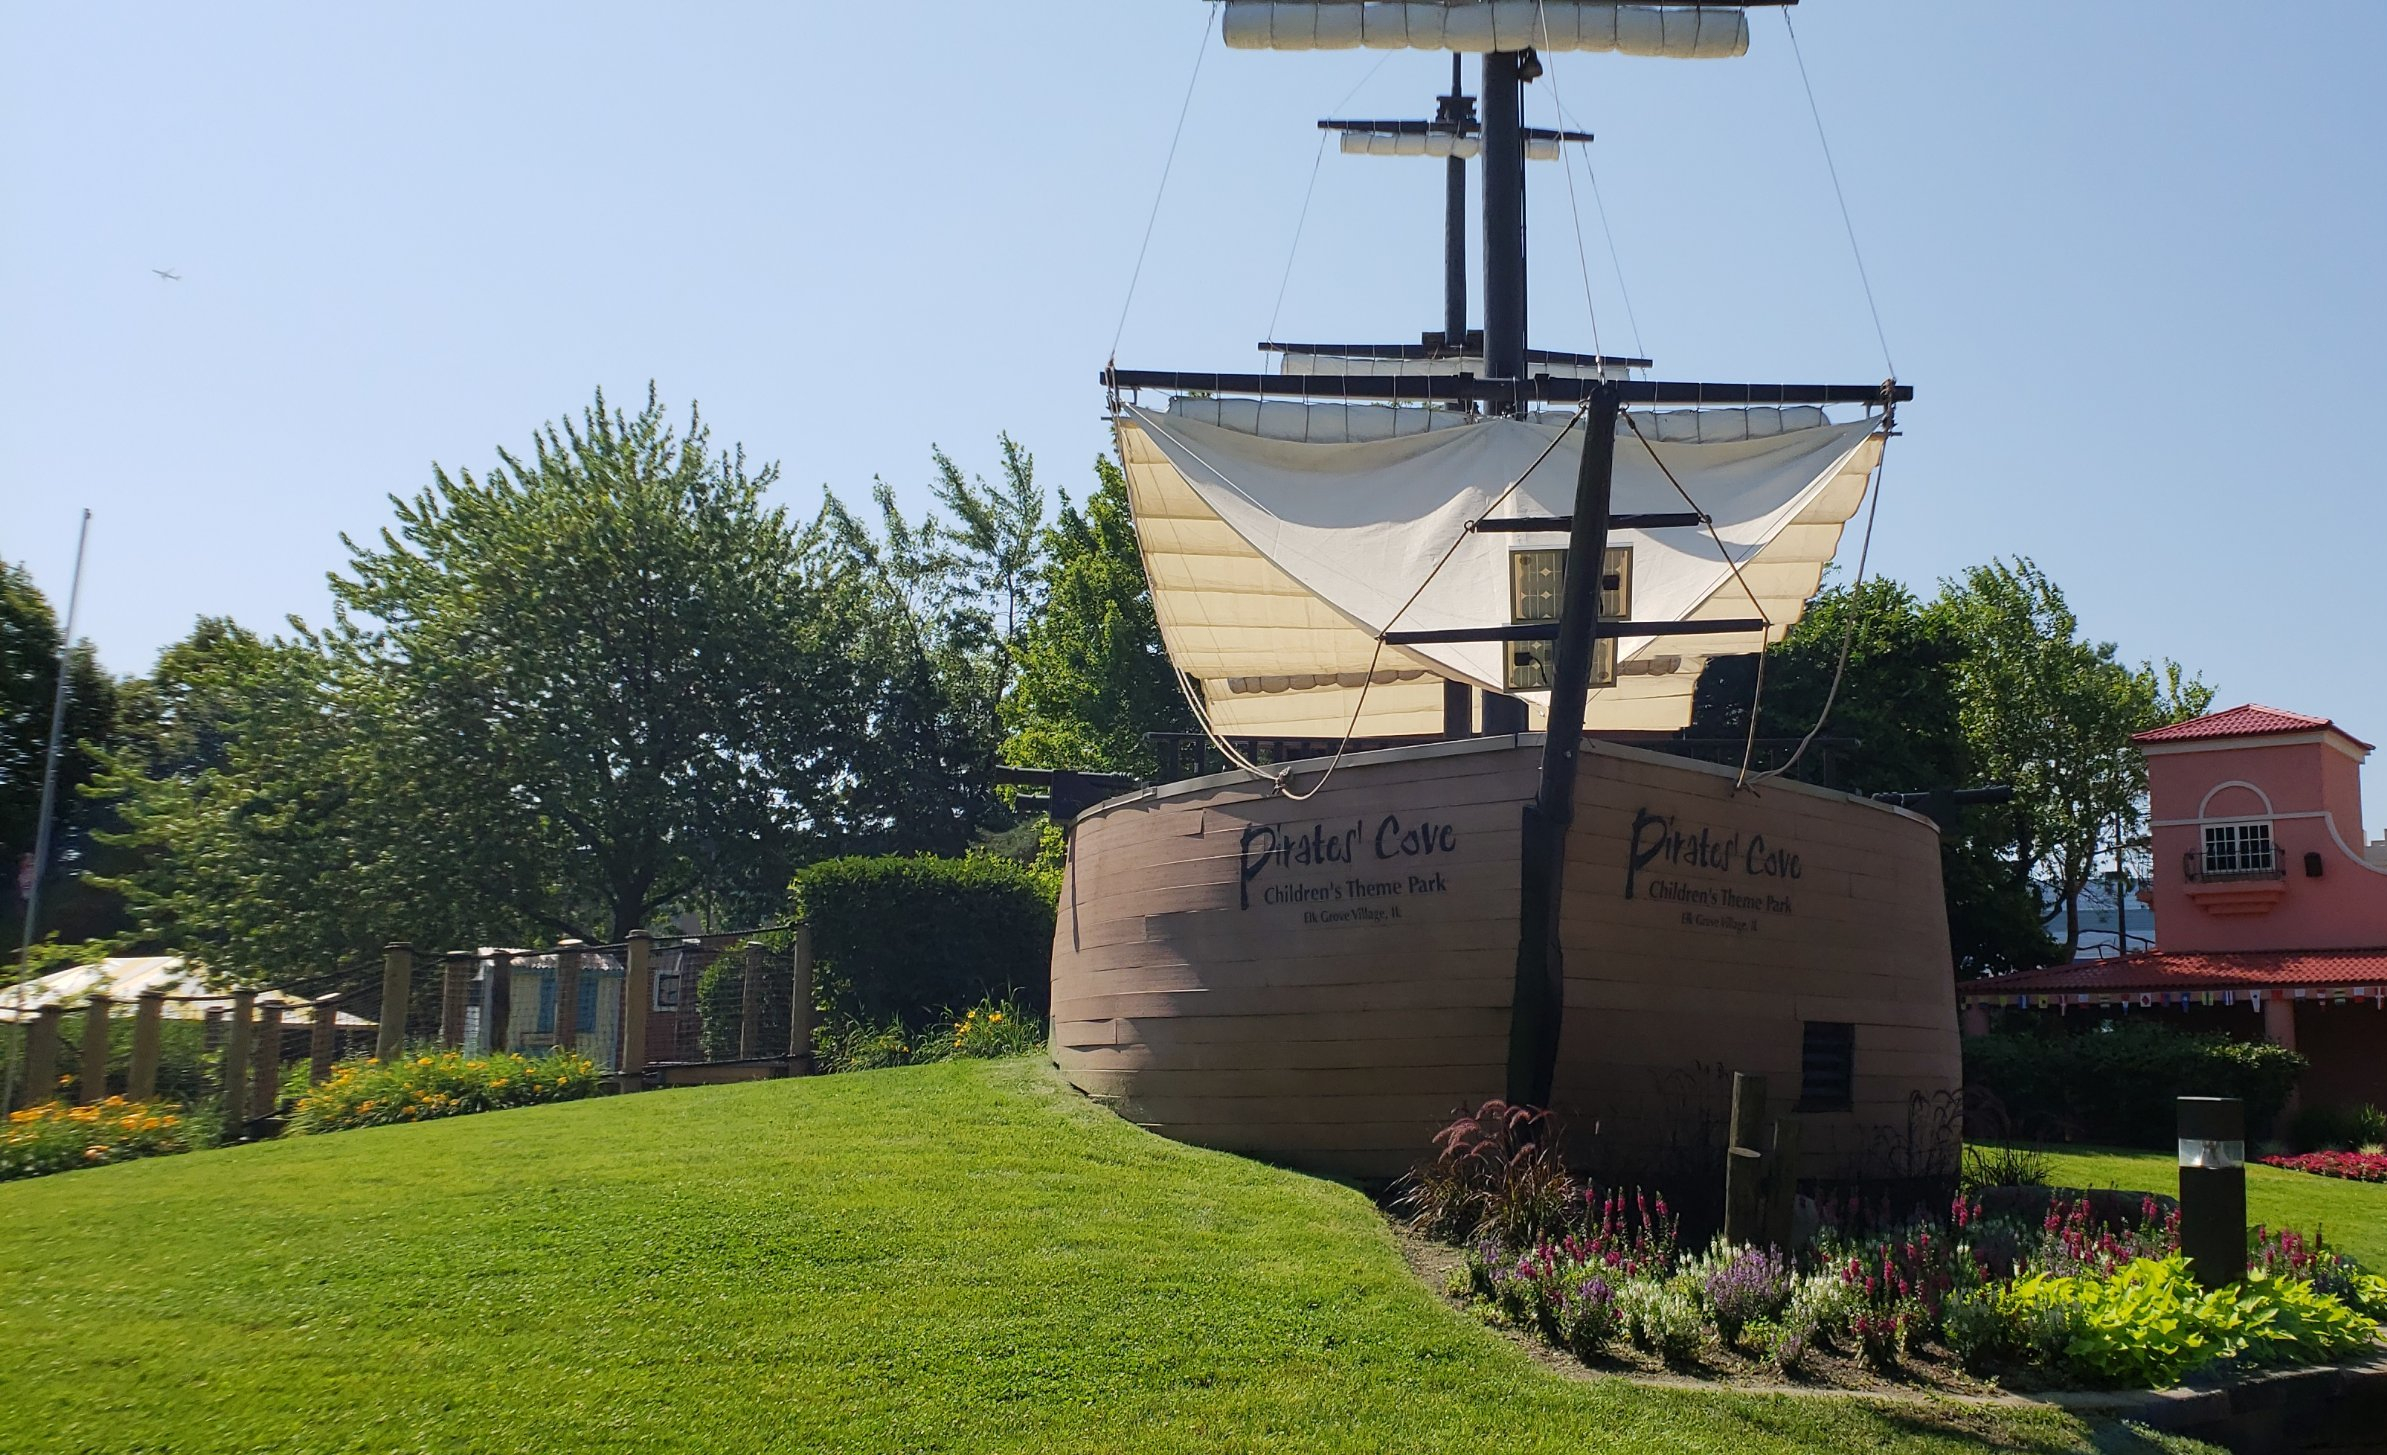 Pirates Cove Children's Theme Park – Illinois